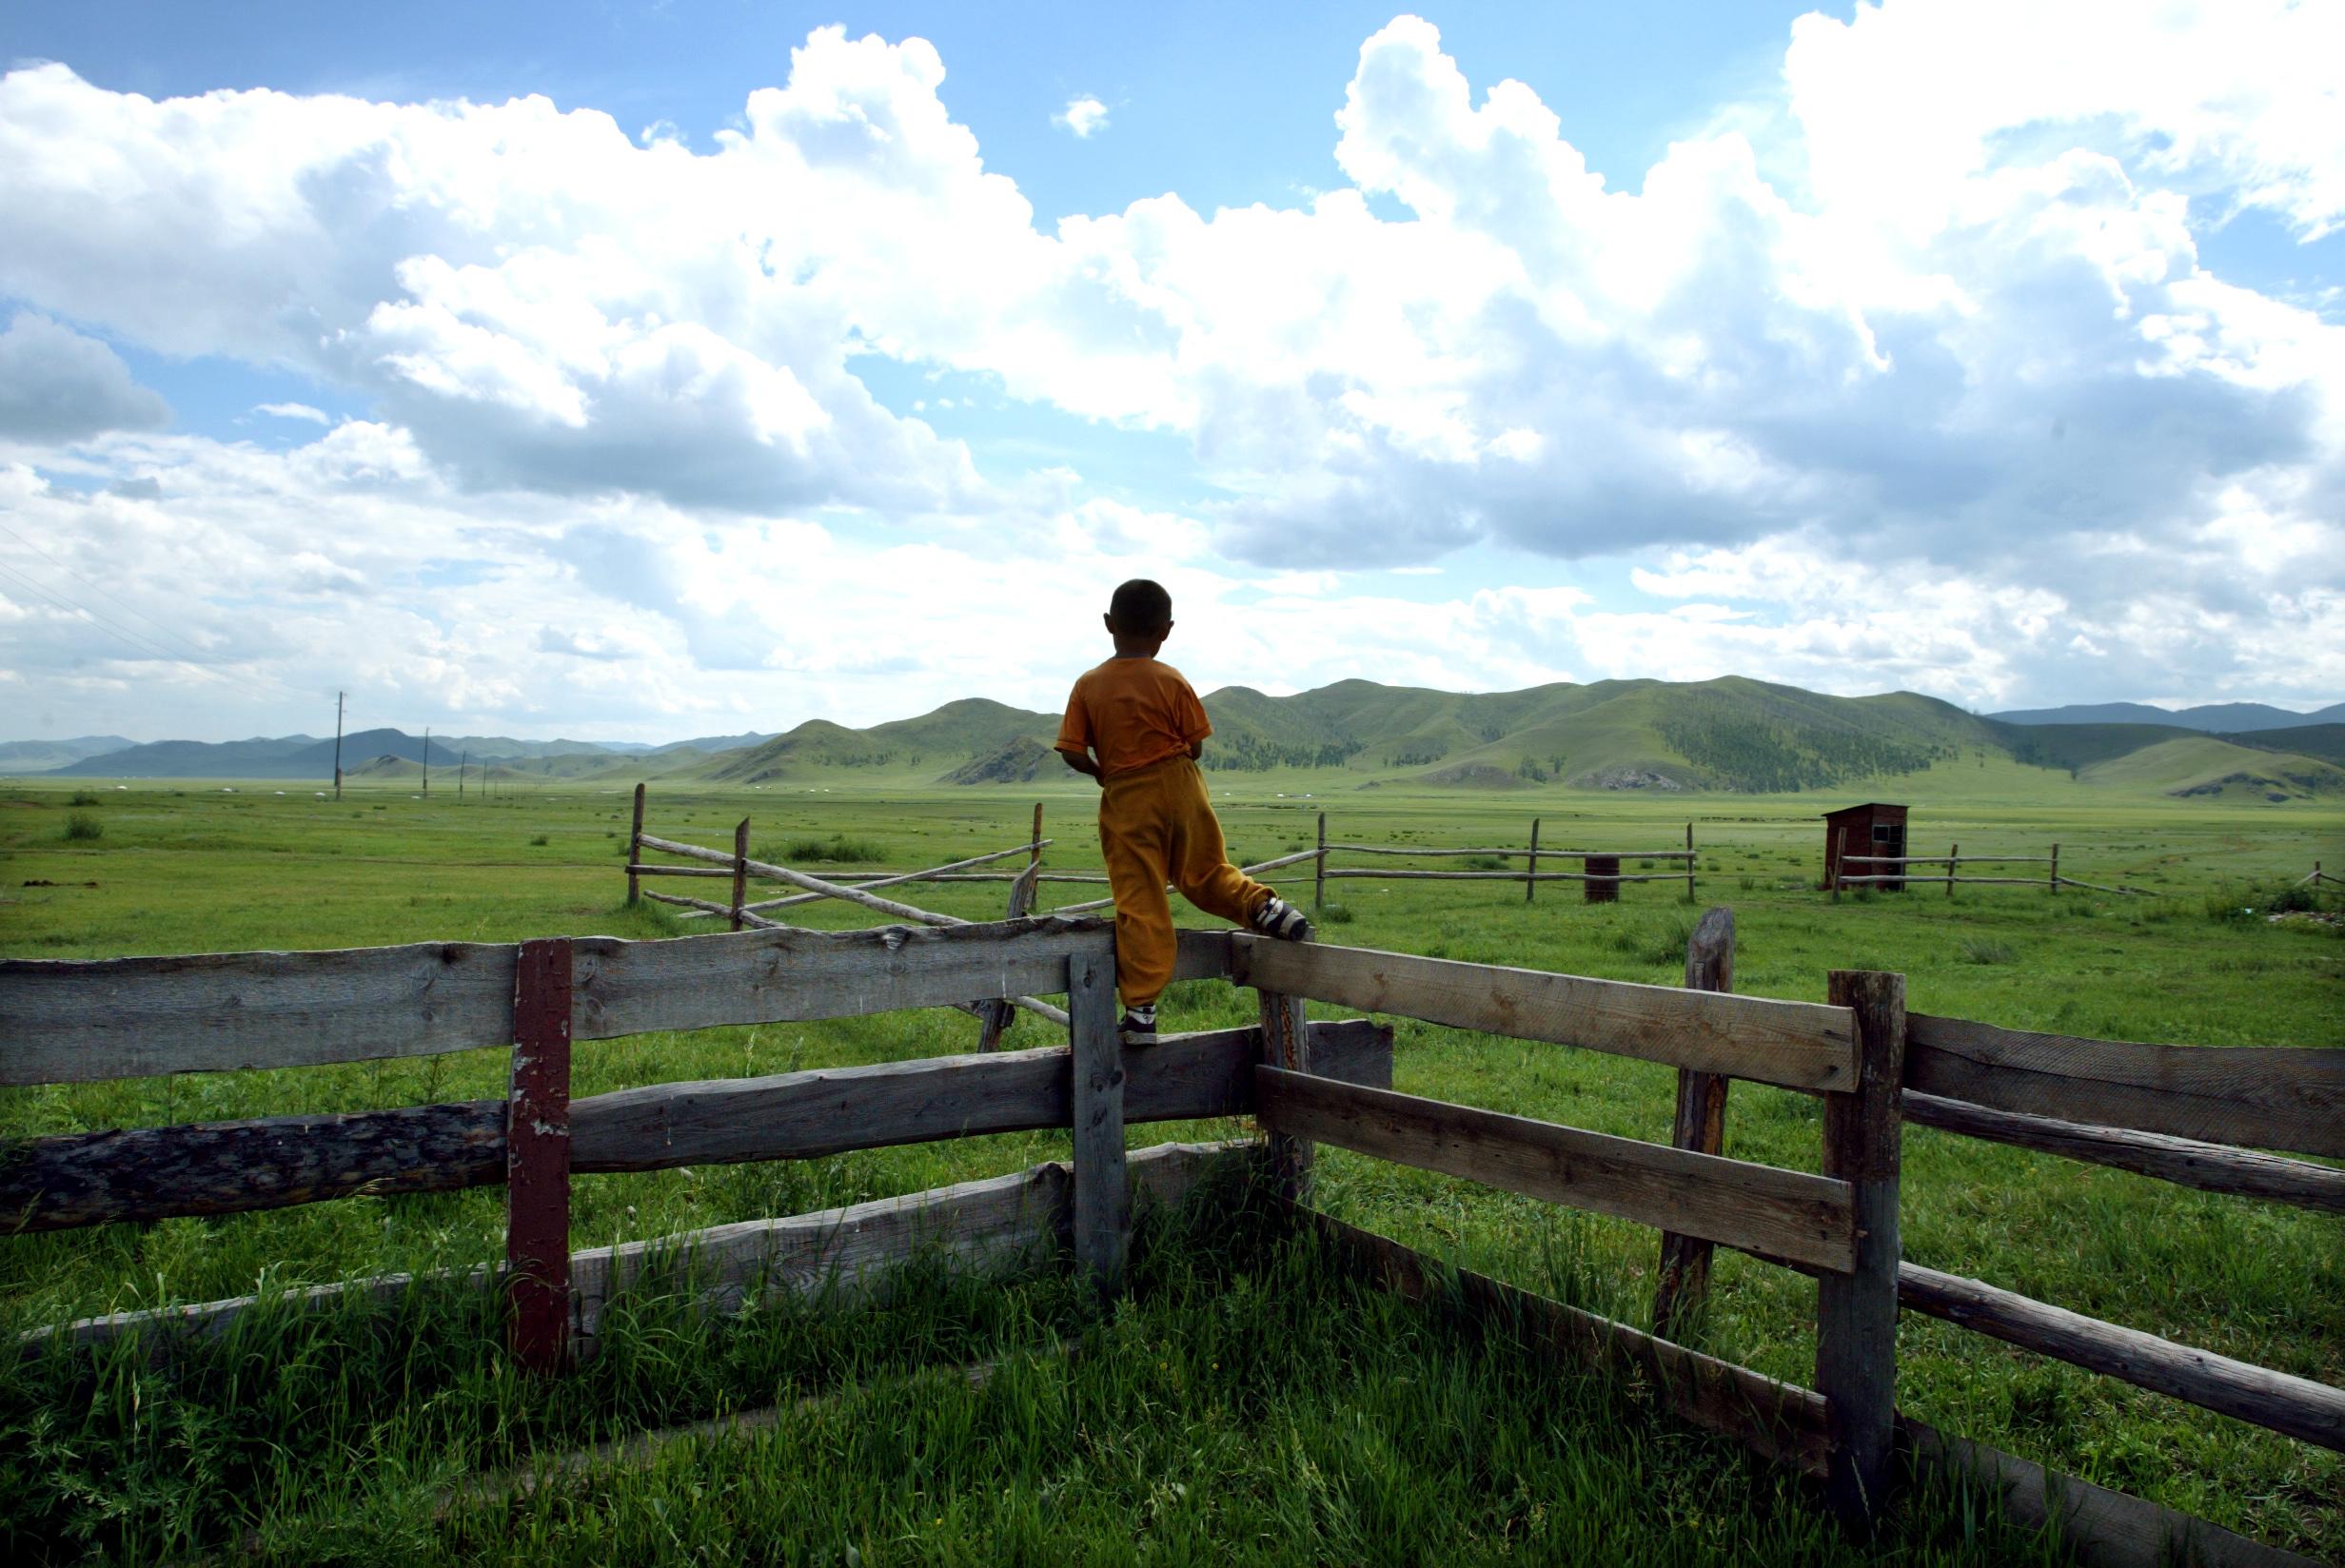 mongolia_child001